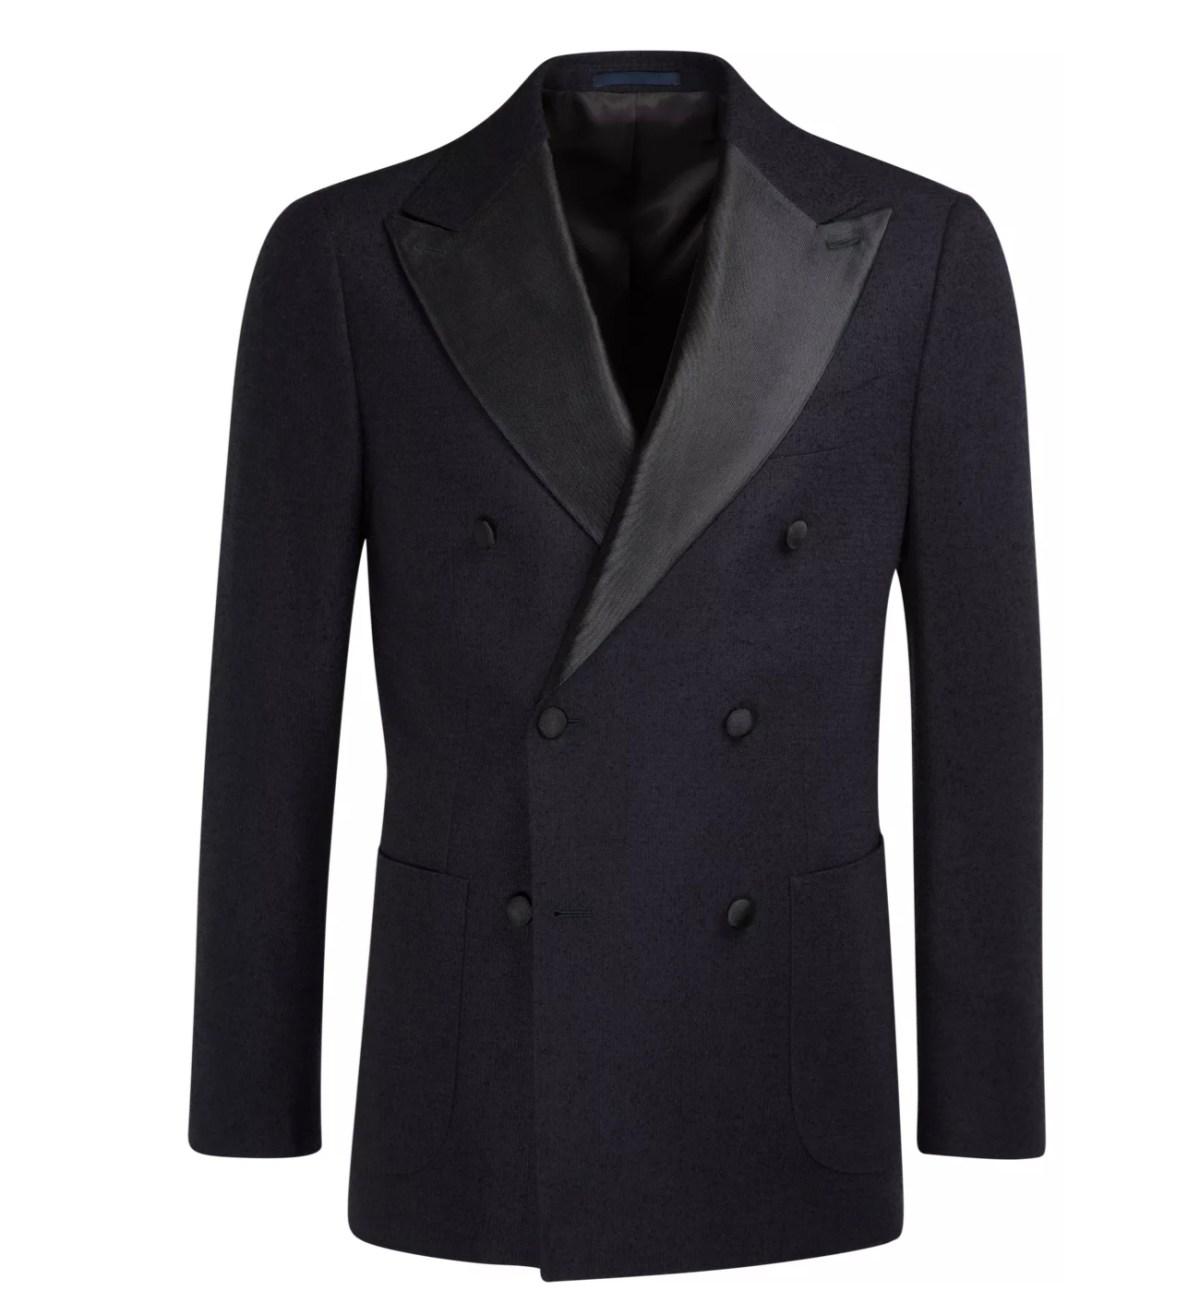 Holiday Attire for Men - Blue Tuxedo